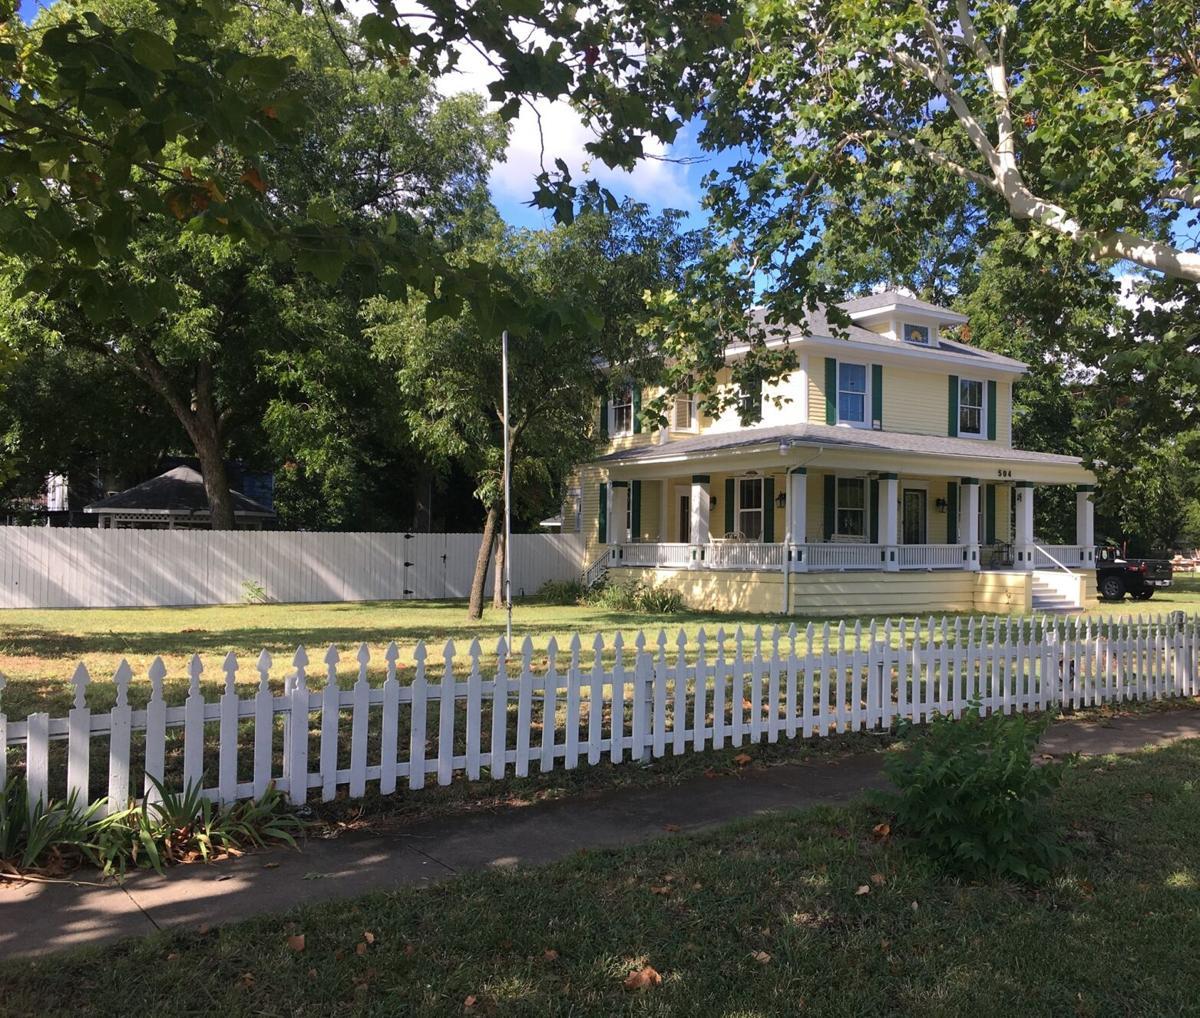 Celina couple seeks historical designation for their home